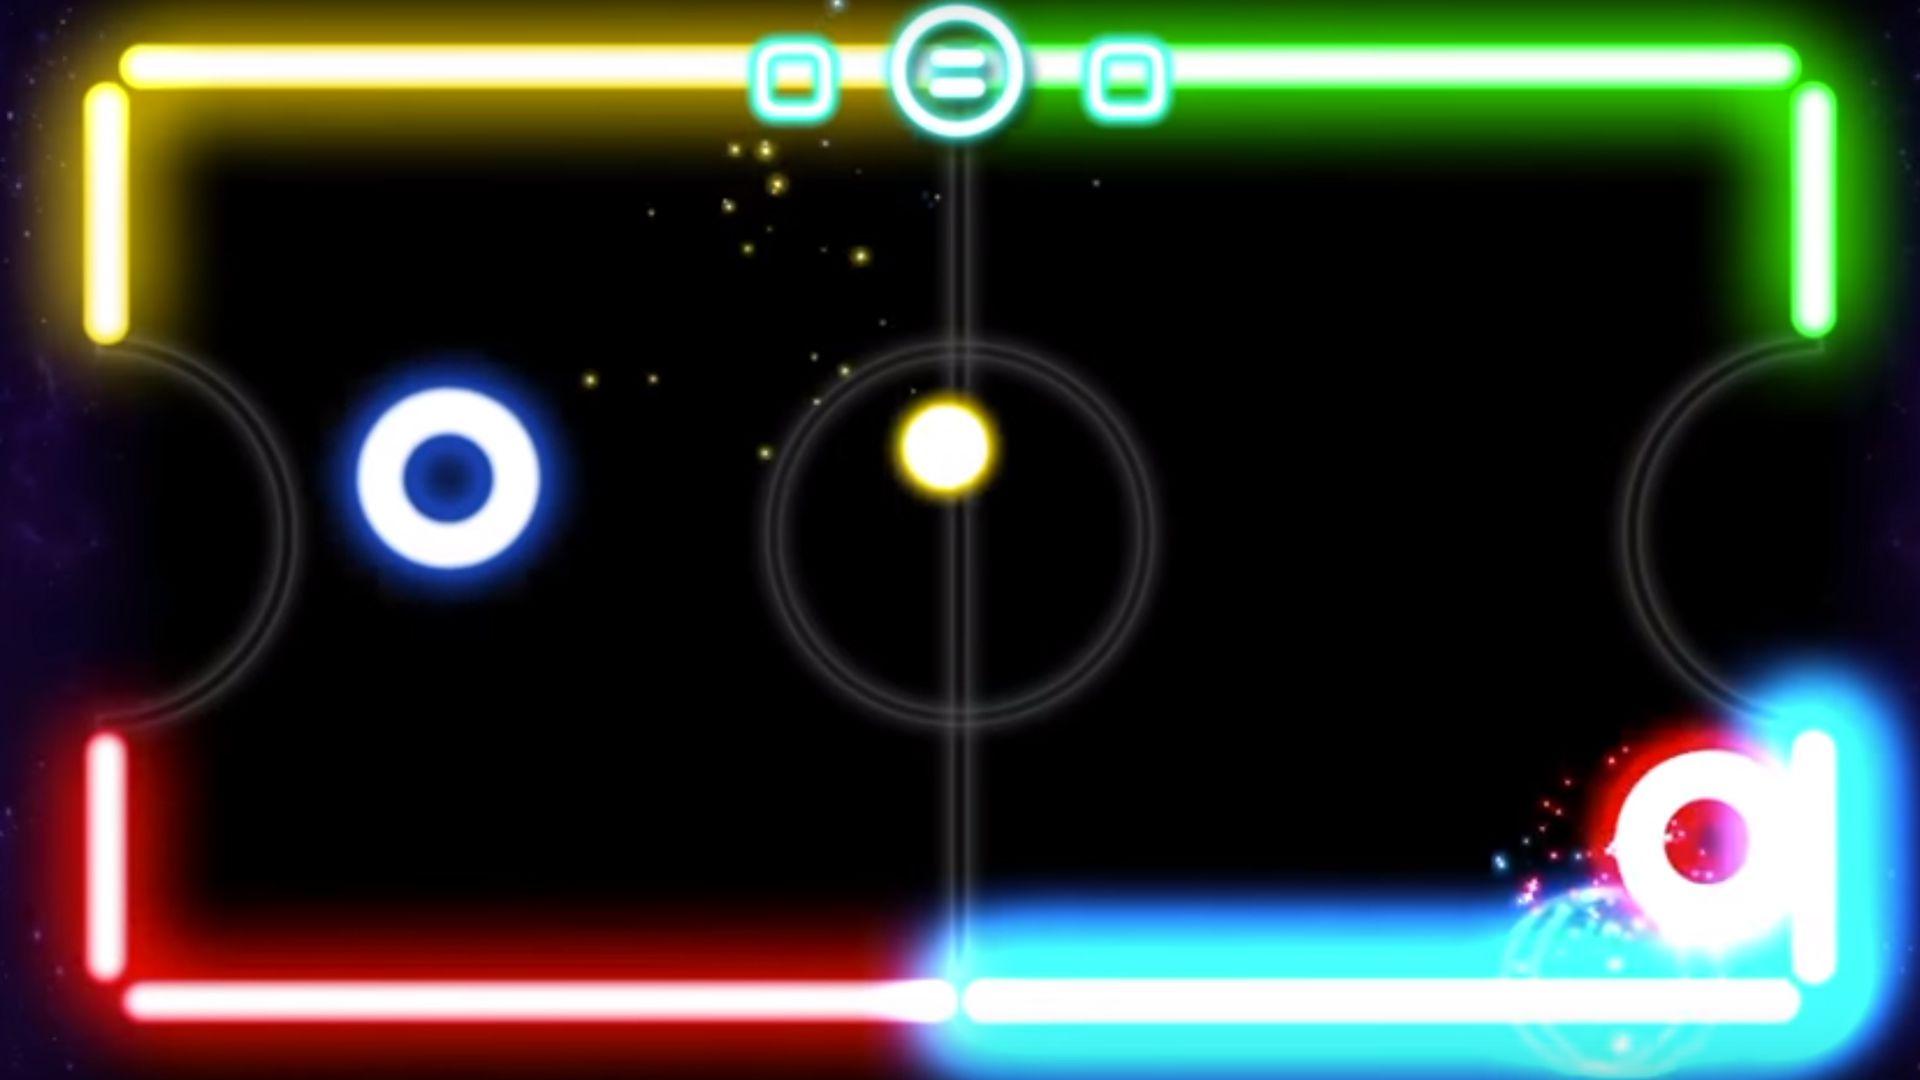 Glow Hockey 2 local offline multiplayer game.